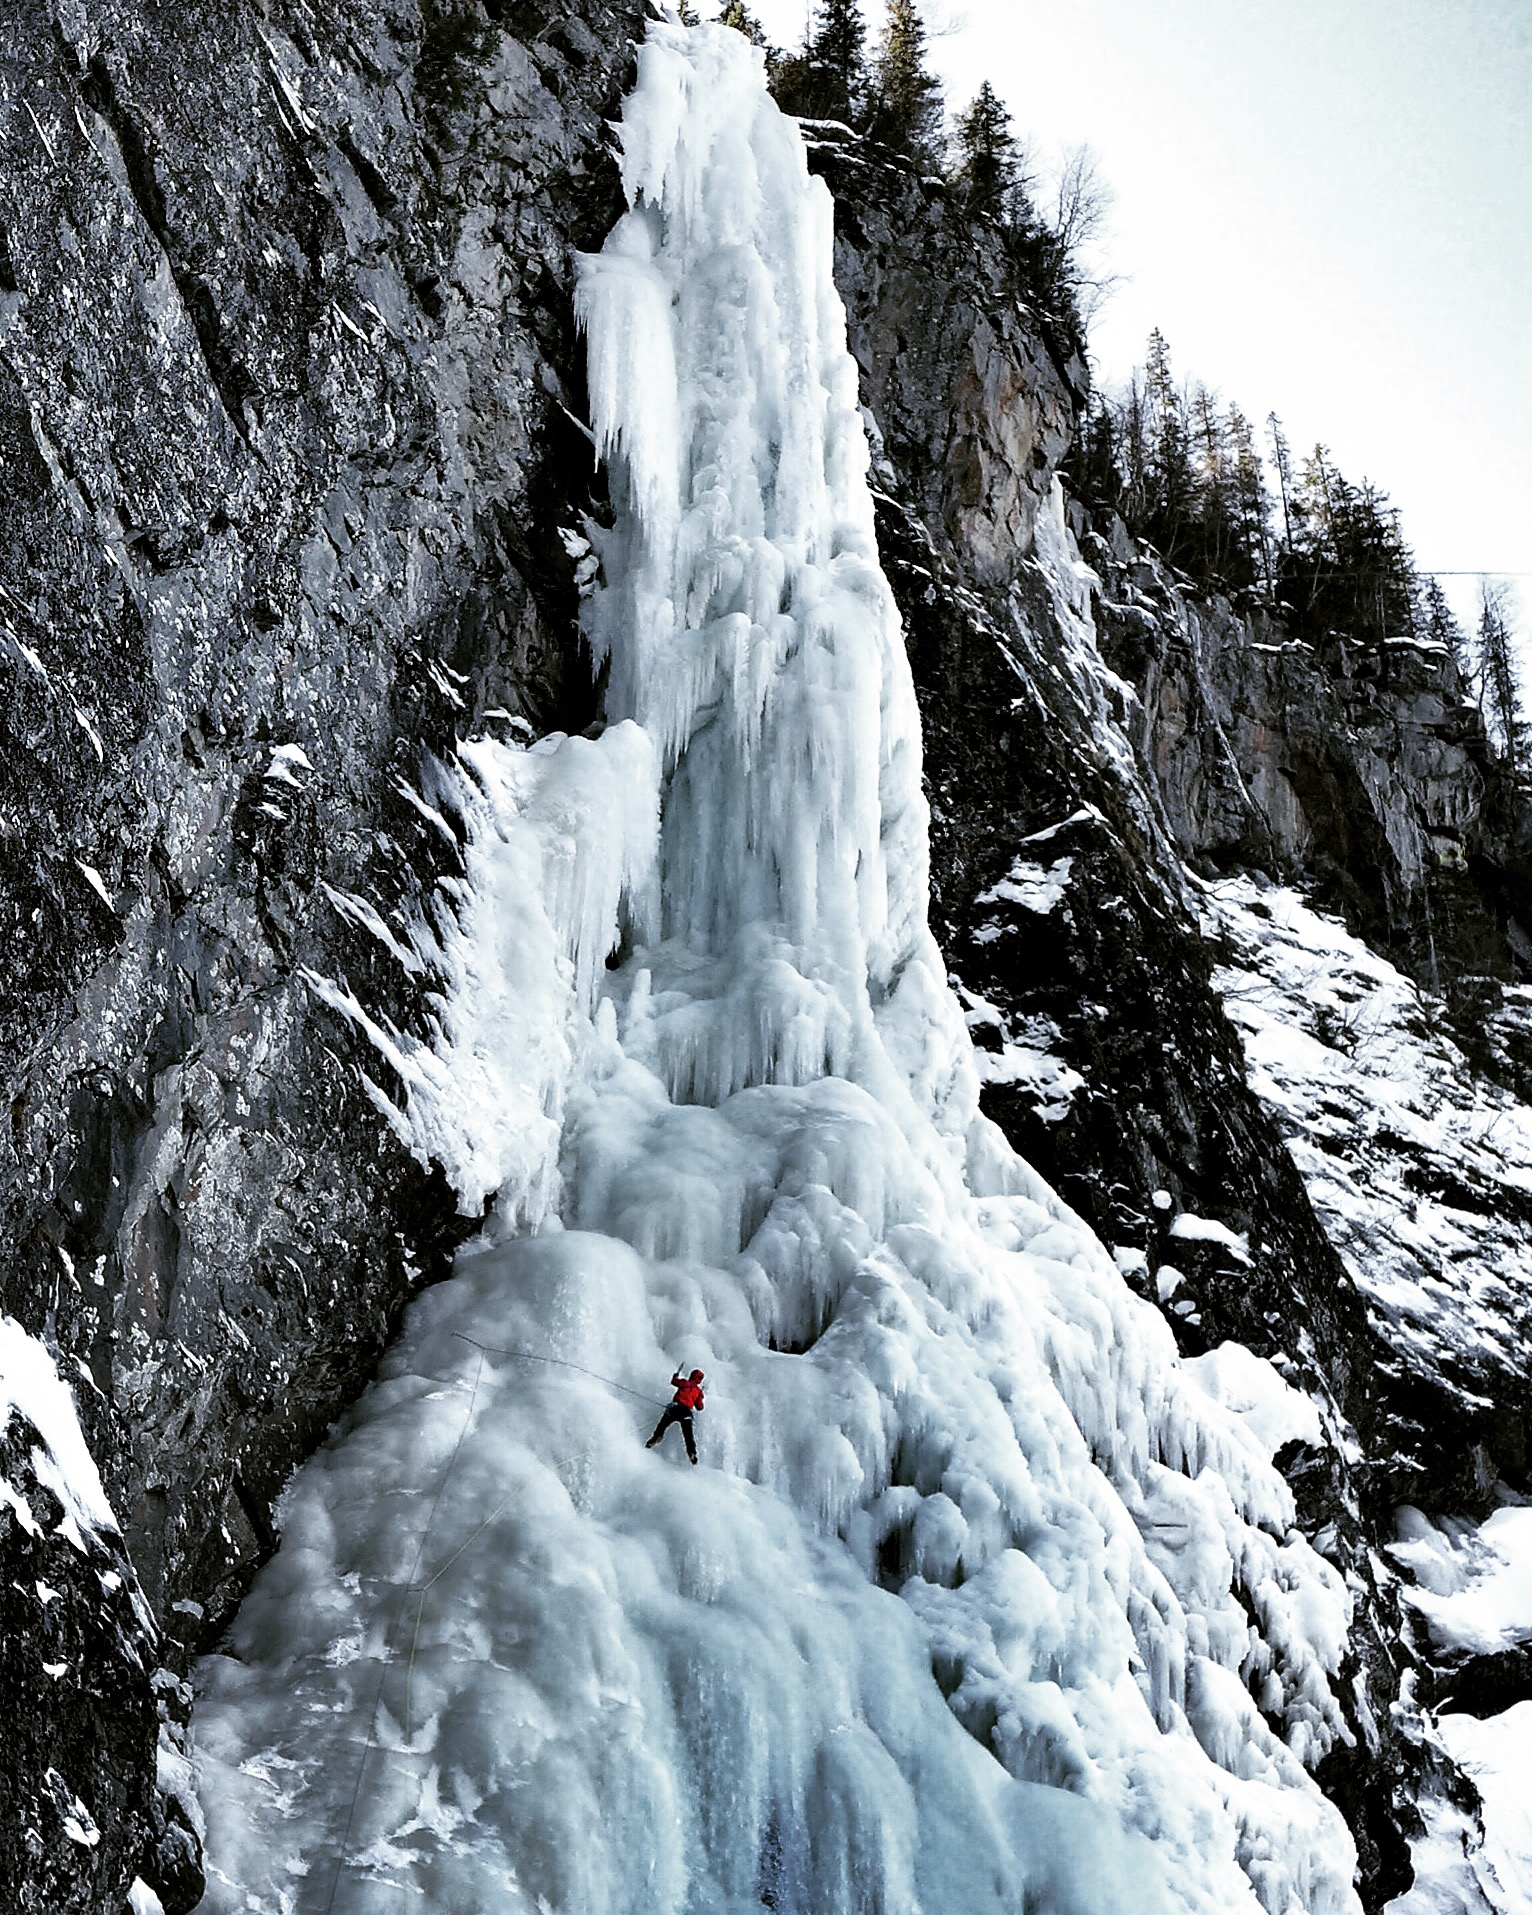 Matthias Scherer on Haugsfossen, Rjukan, Norway - picture Tanja Schmitt